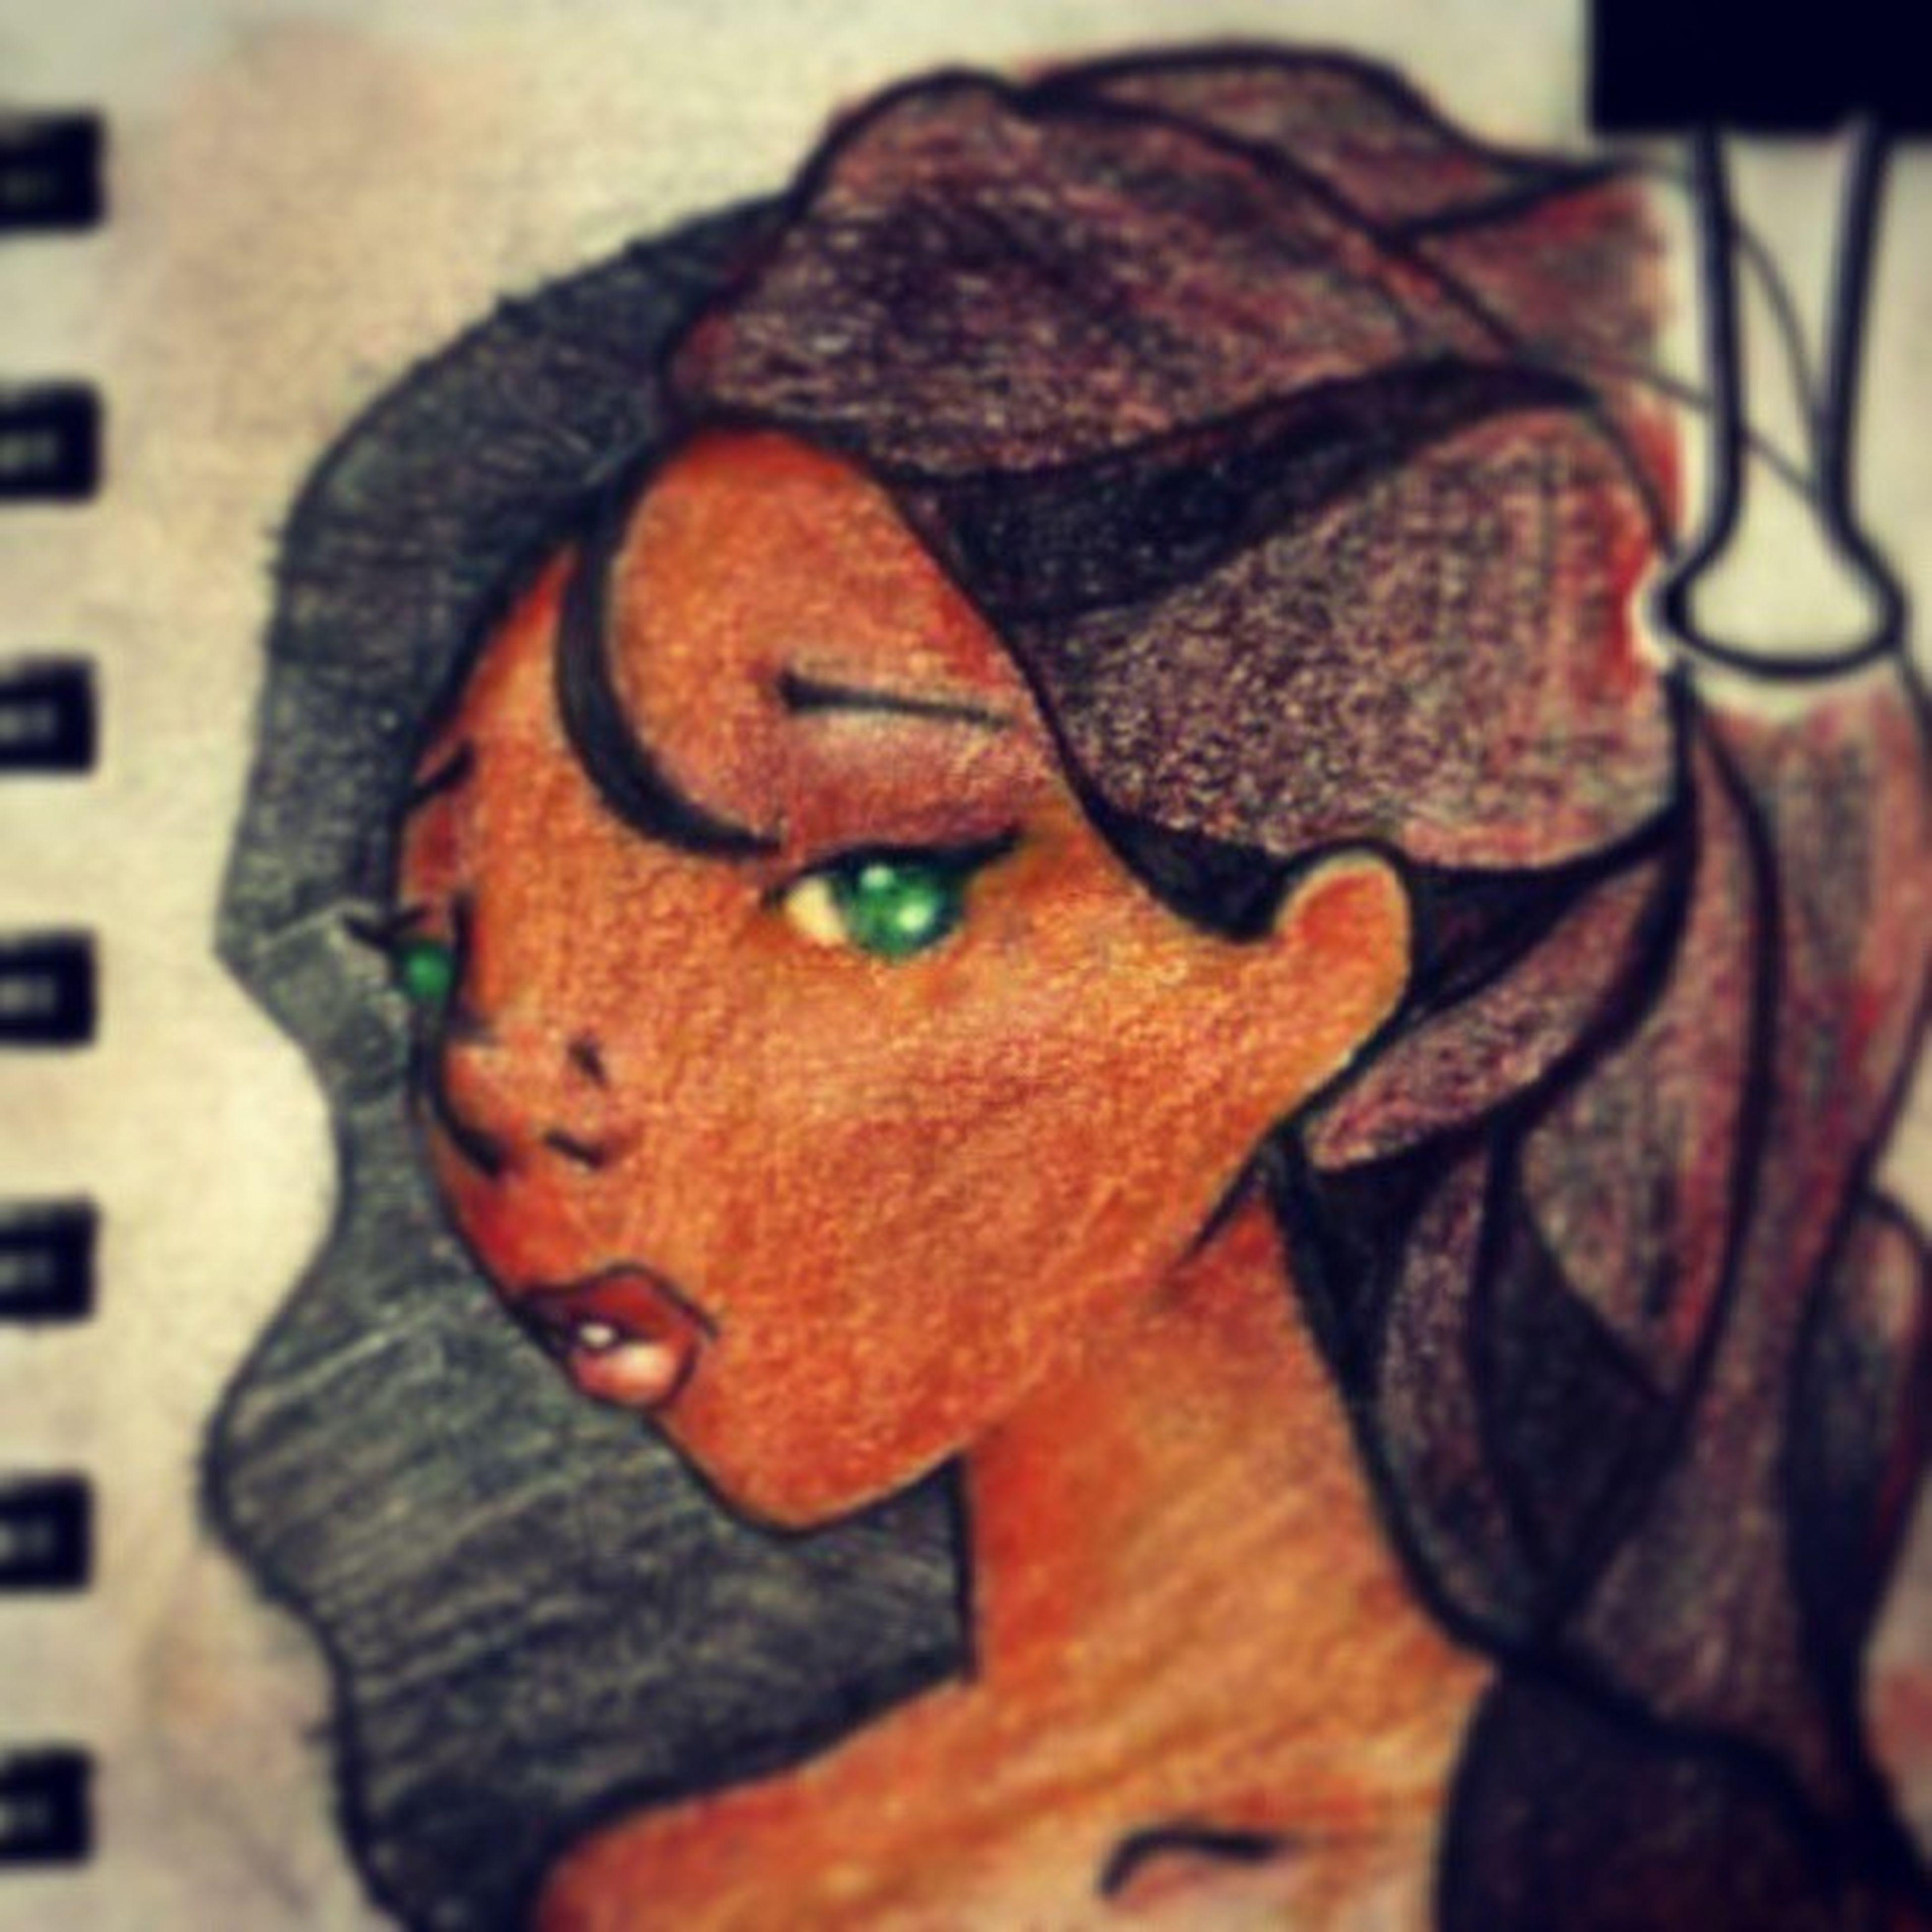 Green Eyes Almond Skin Art, Drawing, Creativity Bode Inspired